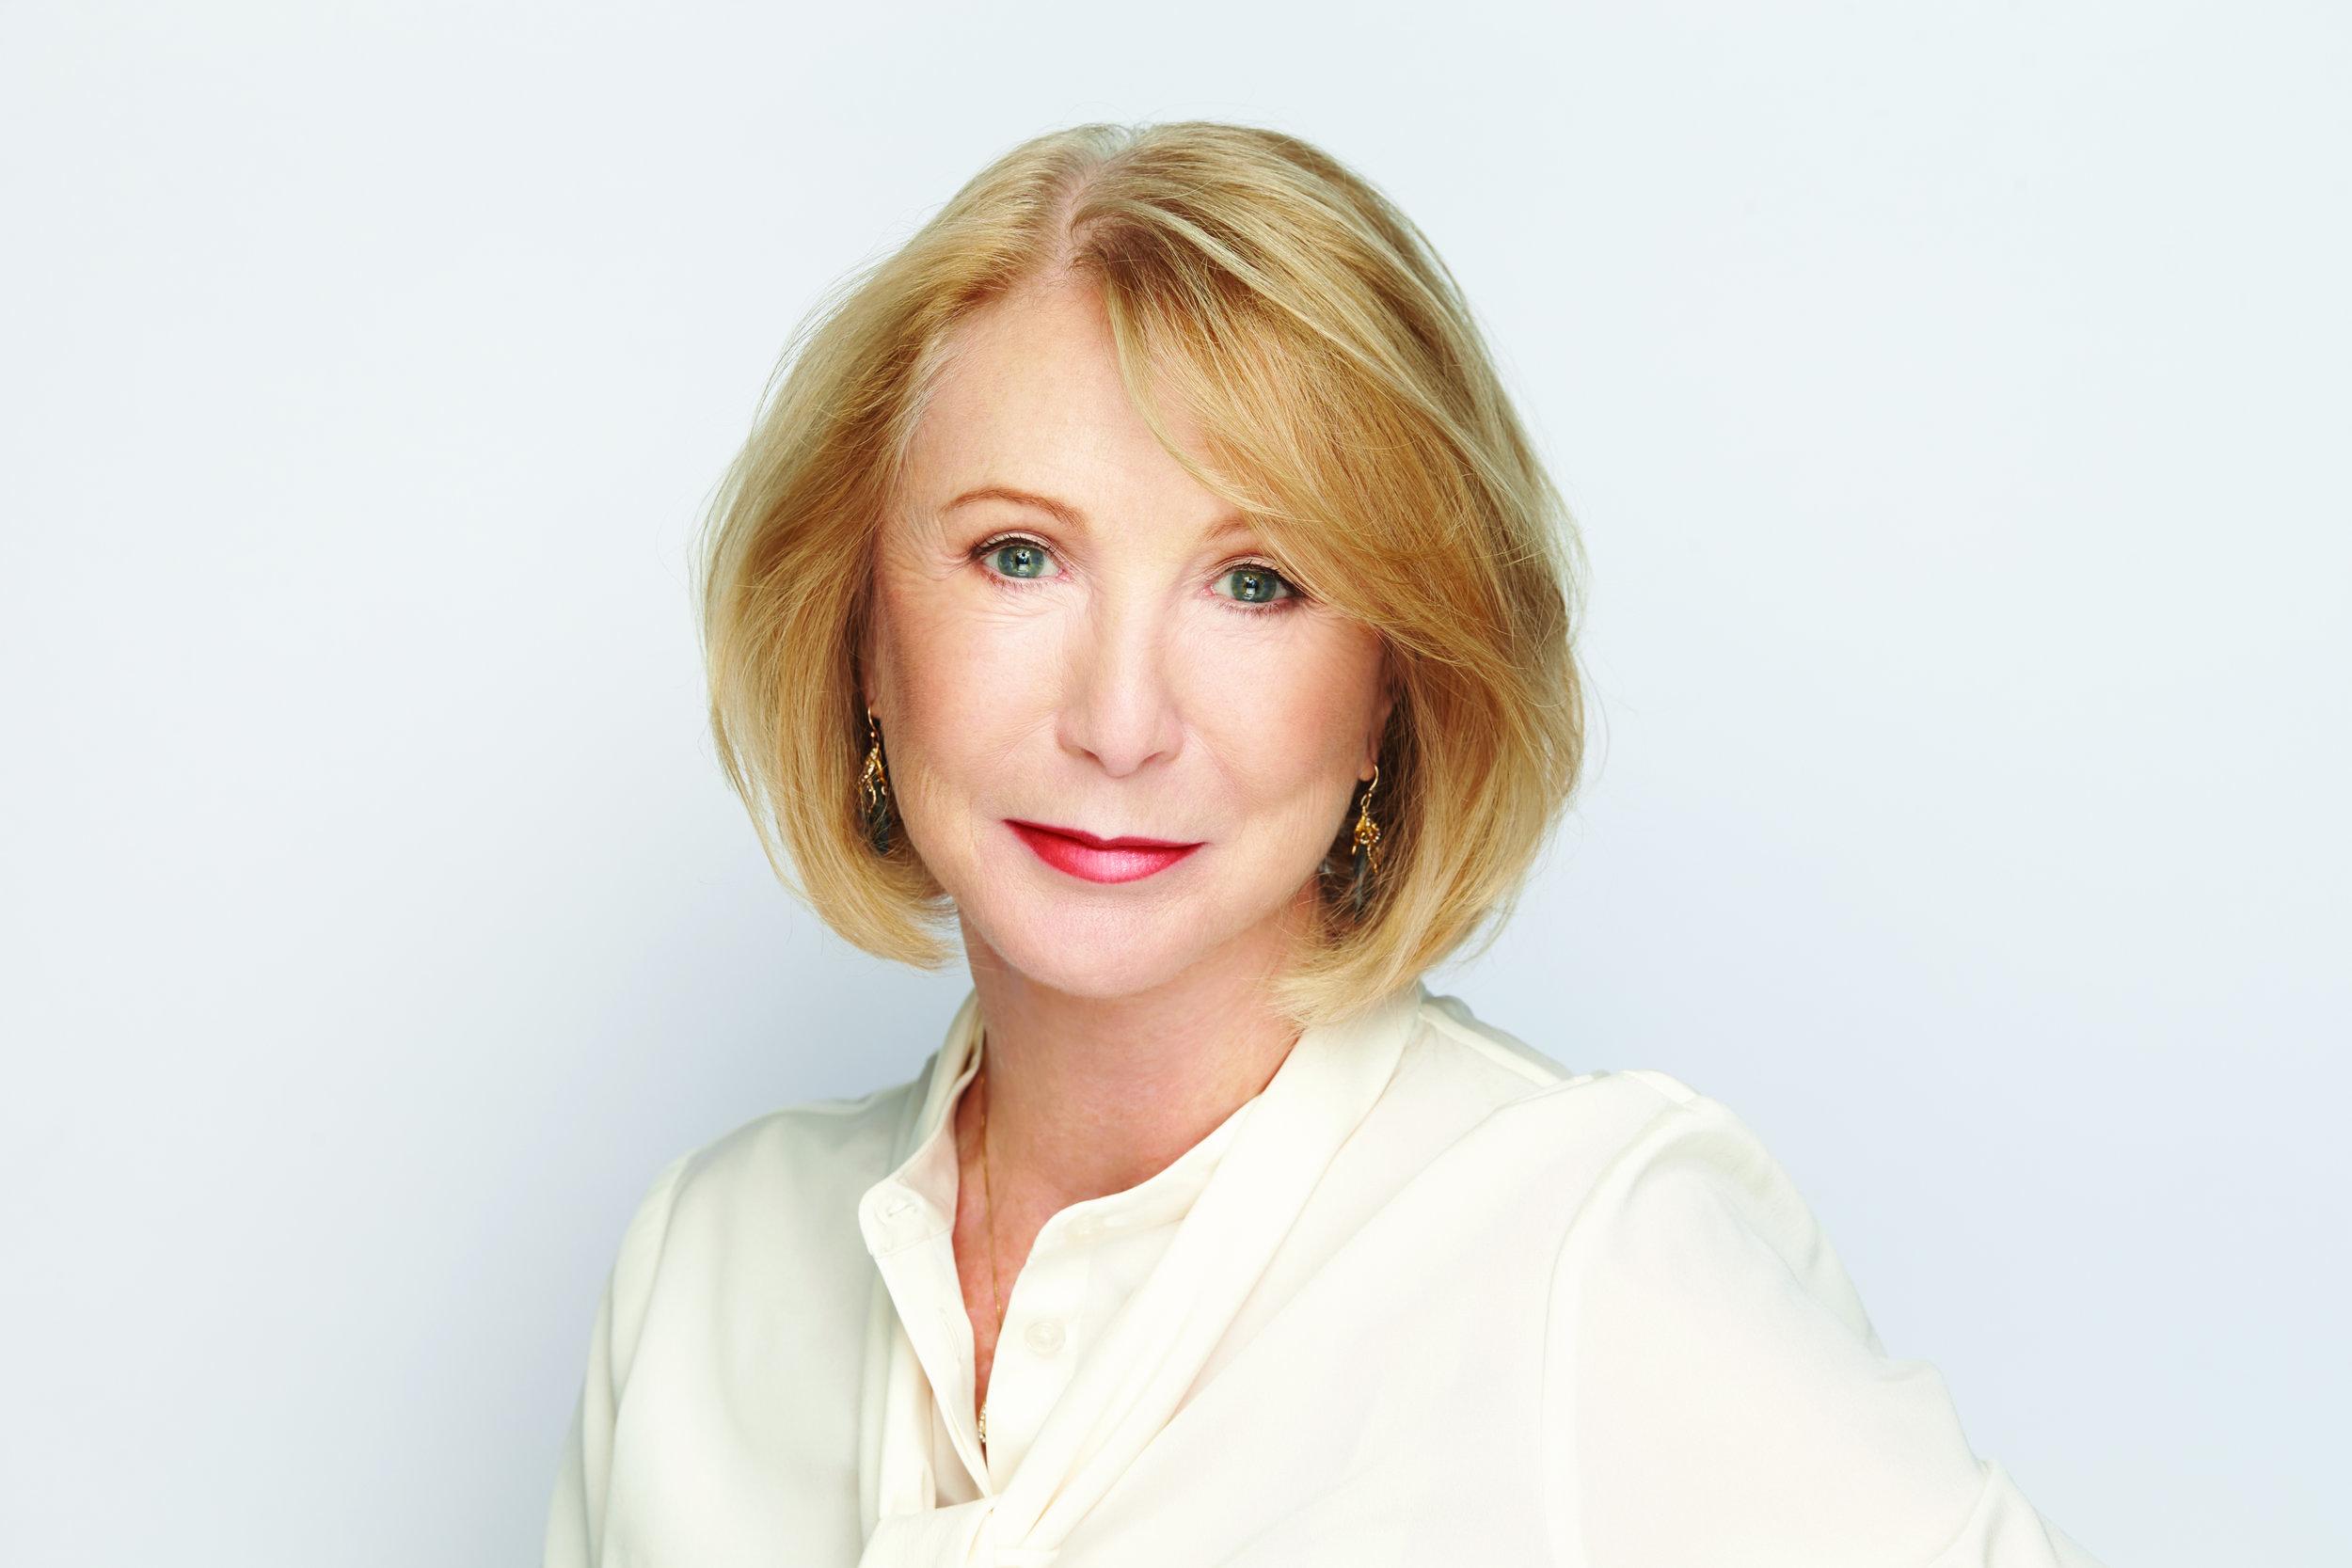 Jane Iredale, Gründerin von  Jane Iredale THE SKINCARE MAKEUP®